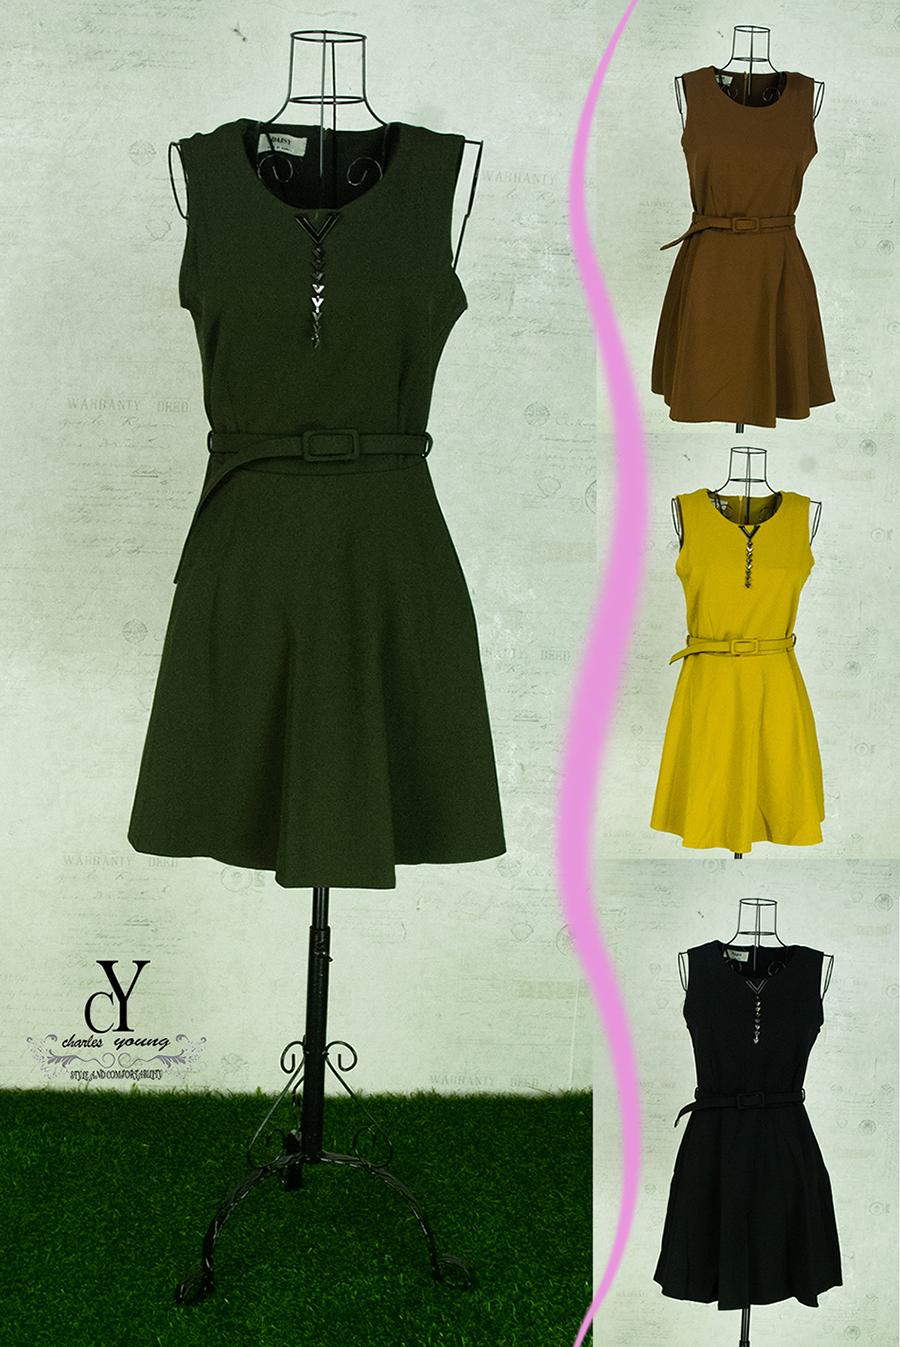 Pasaraya Cy Produk Terbaru Kate Spade Small Rachelle Brightwater Drive Spring Bloom Green Hijau 411 And Summer Womens Korea Easy To Wear Thin A Line Mini Dress